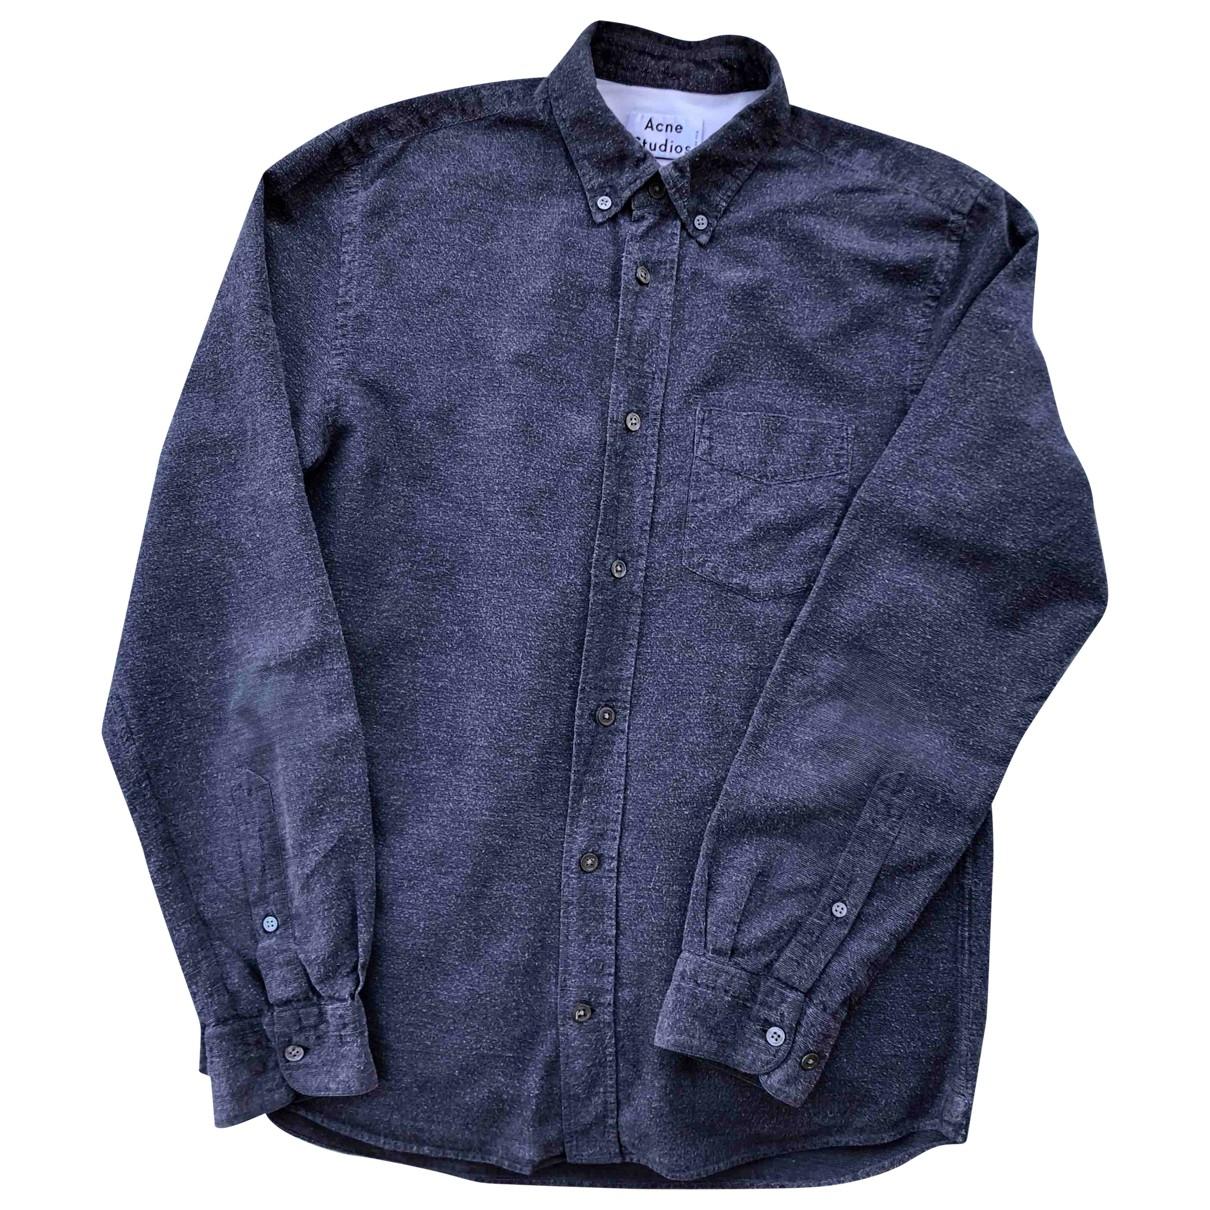 Acne Studios \N Grey Cotton Shirts for Men S International